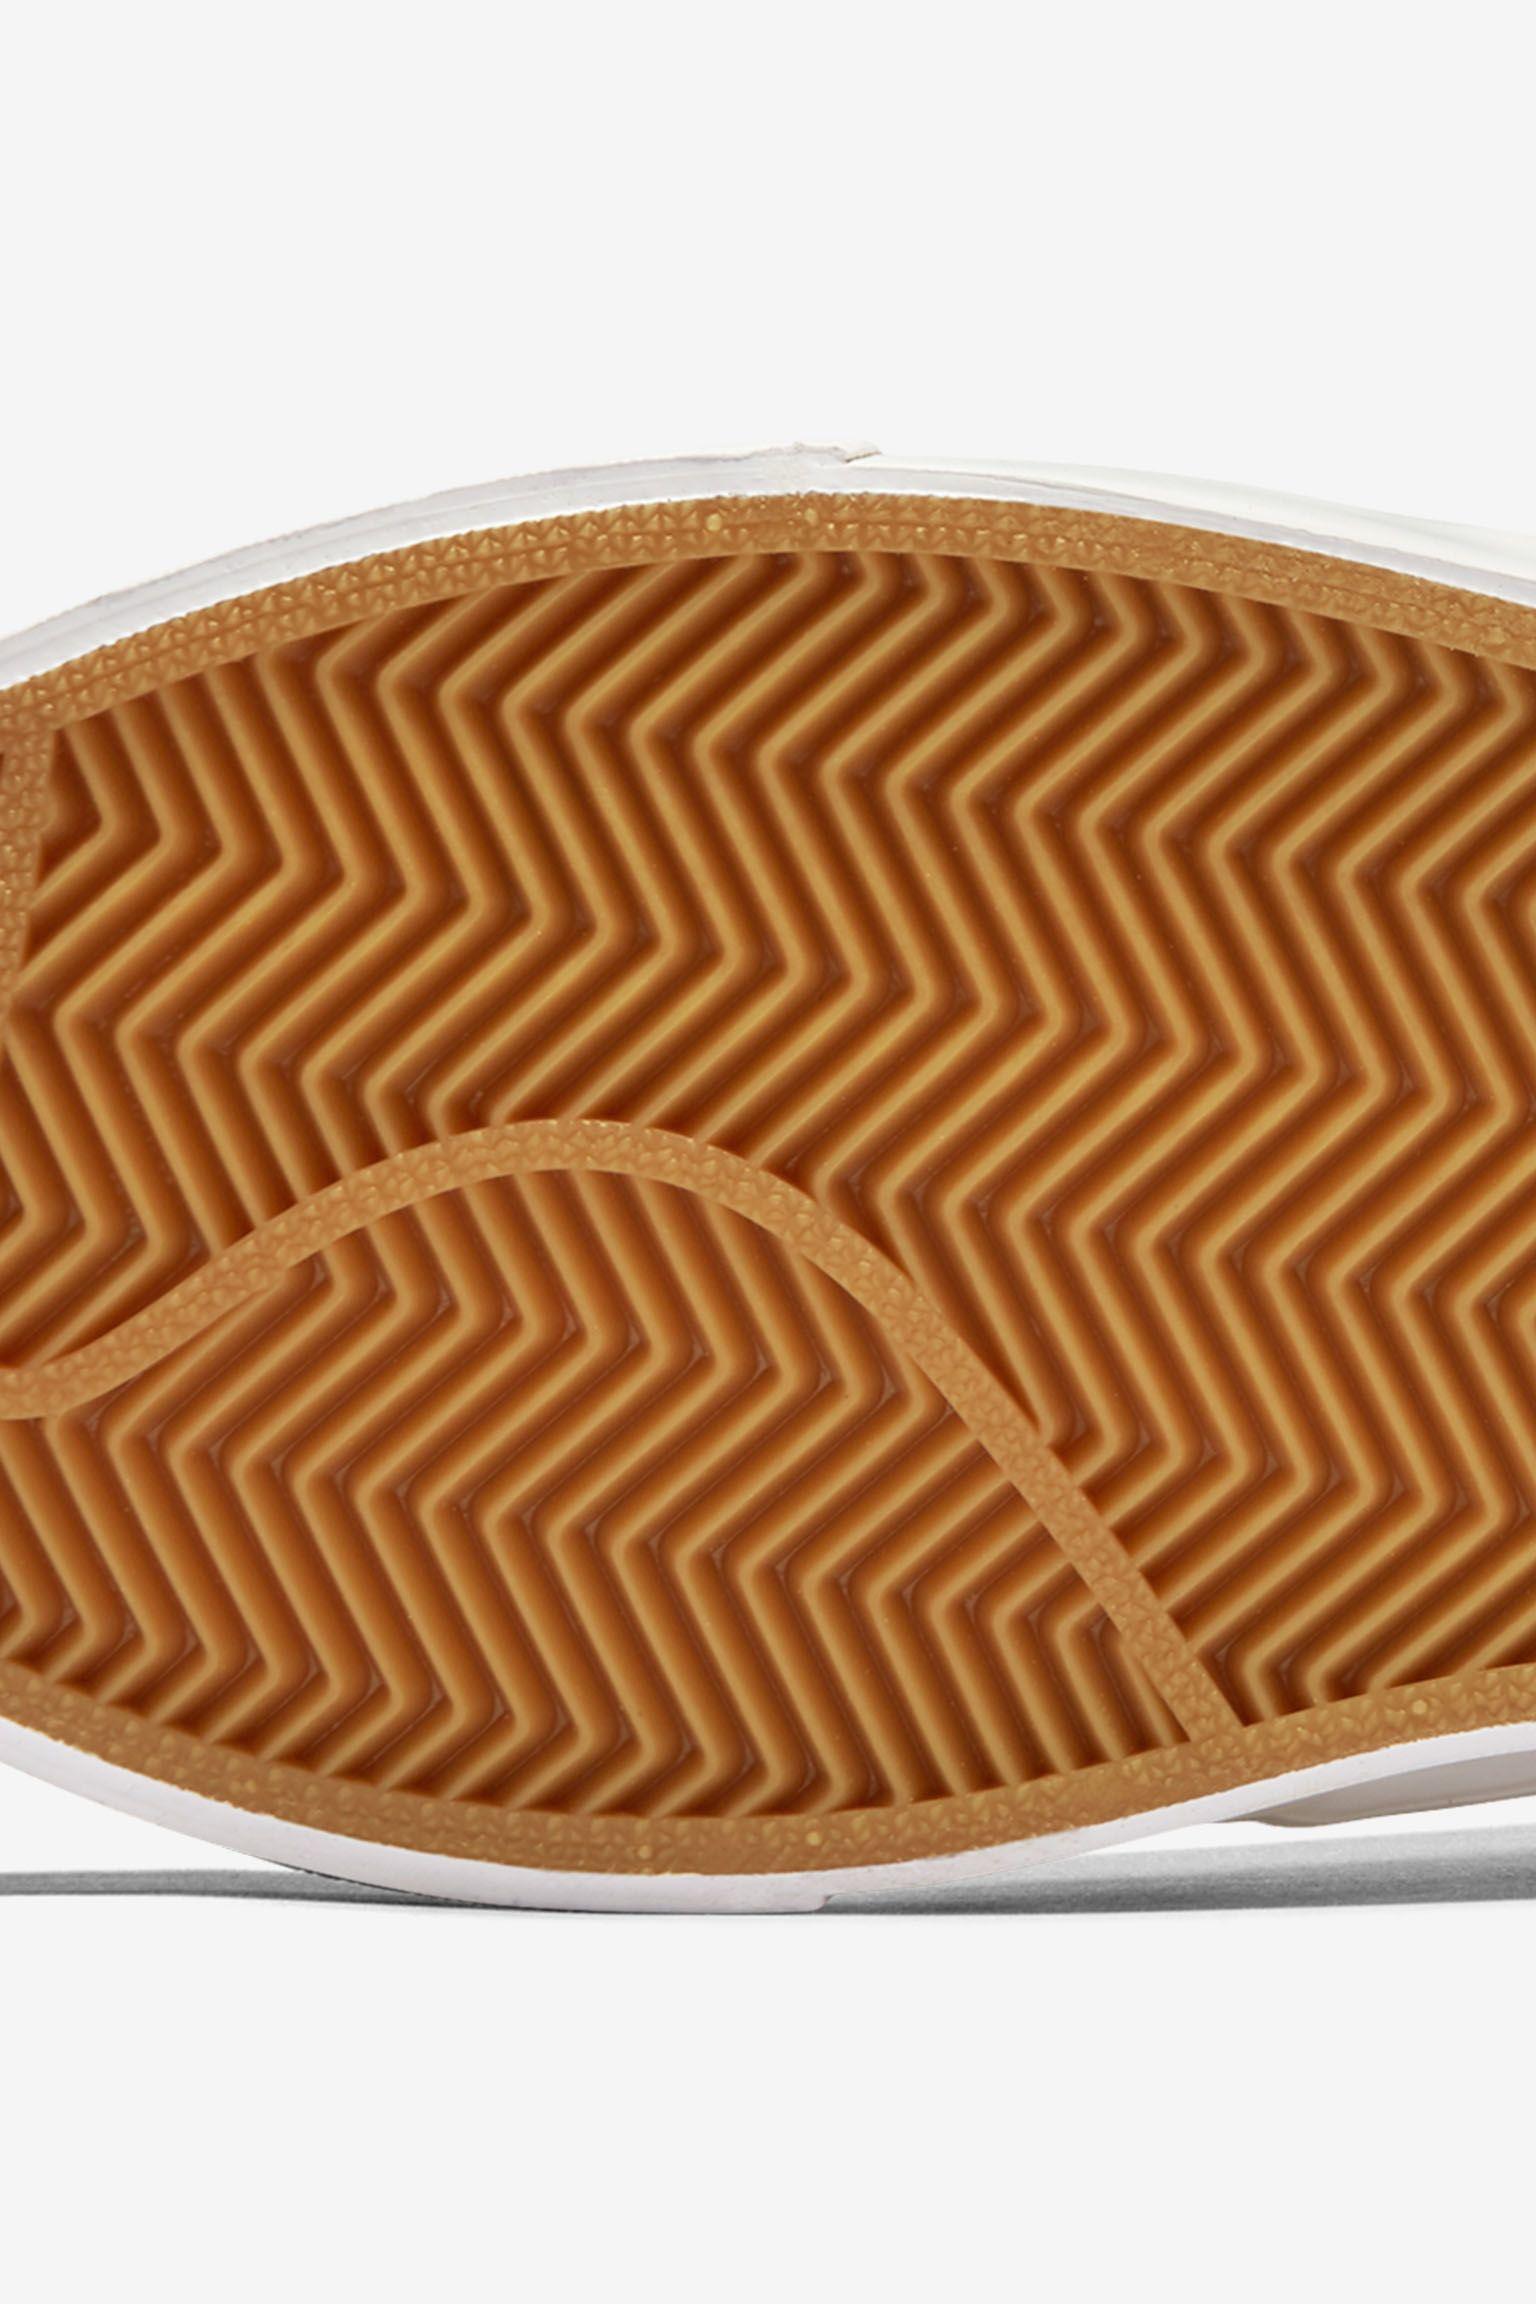 Nike Zoom Stefan Janoski 'SBxFB'